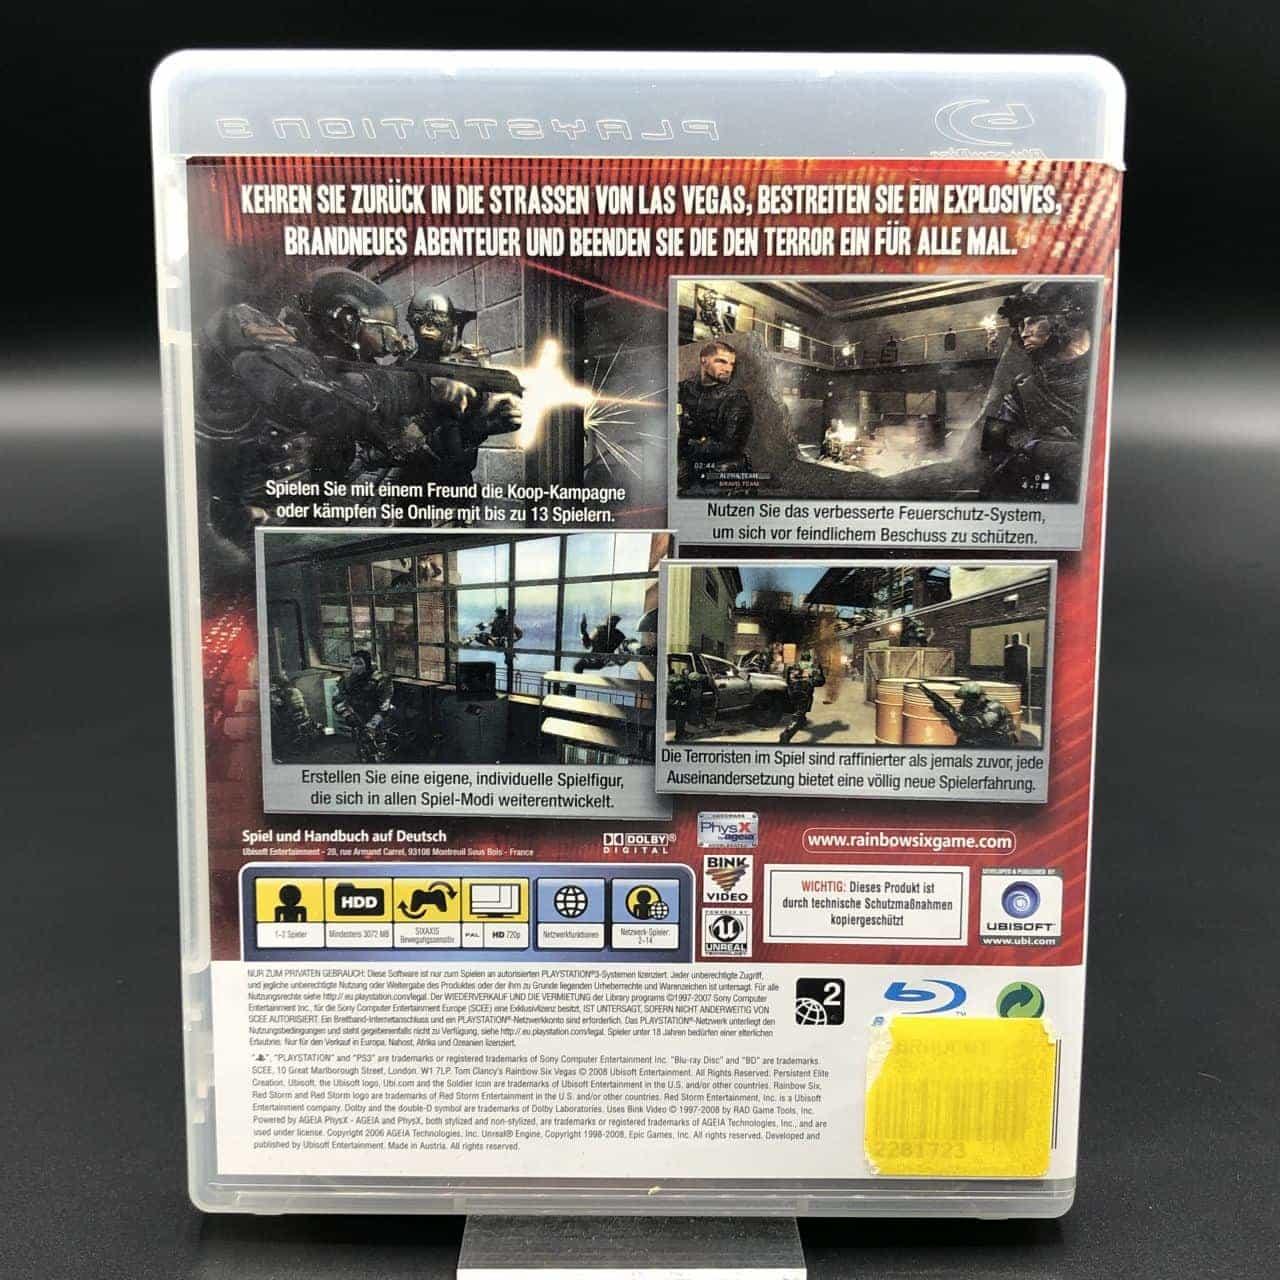 PS3 Tom Clancy's Rainbow Six: Vegas 2 (Komplett) (Sehr gut) Sony PlayStation 3 (FSK18)